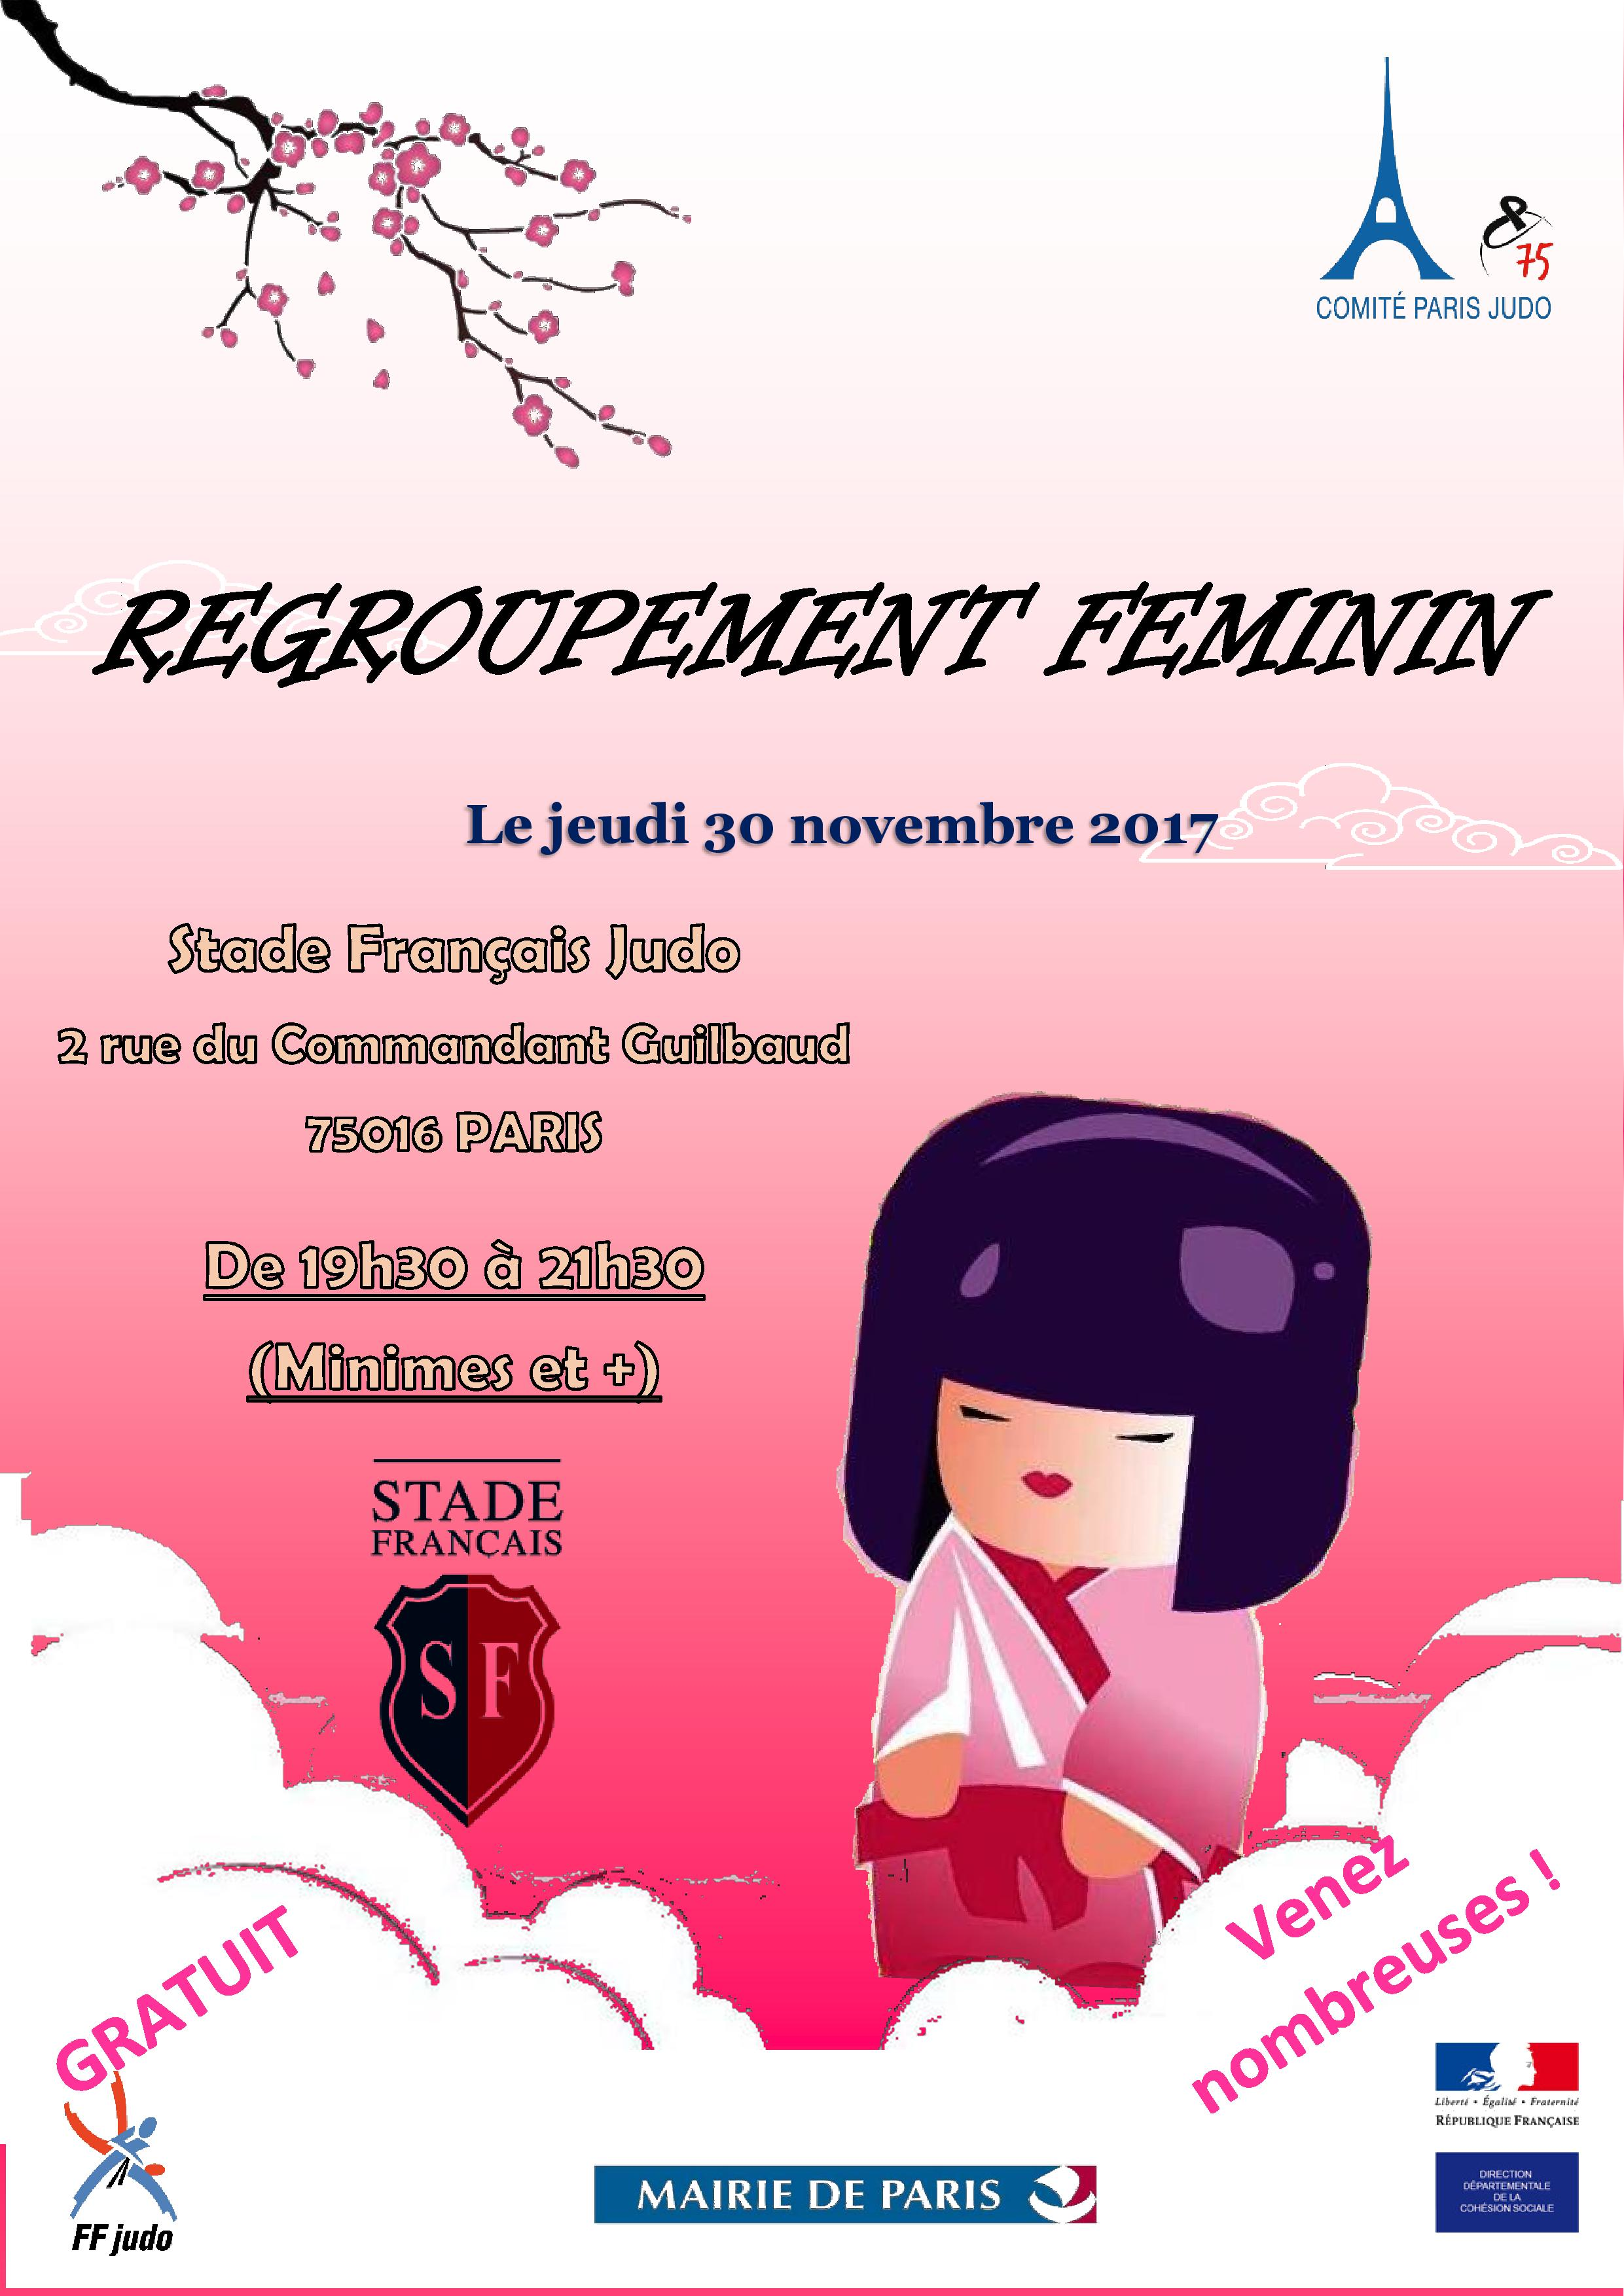 REGROUPEMENT FEMININ